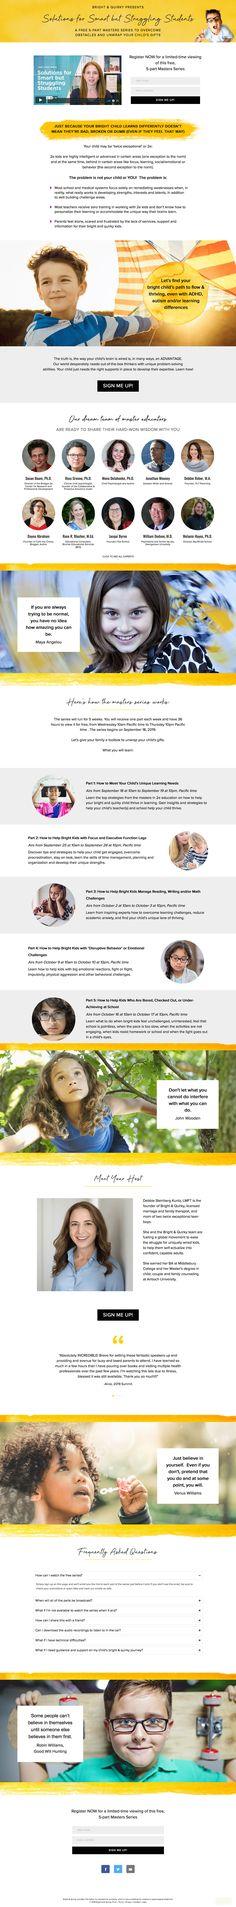 Entrepreneur, Personal Branding, Page Design, Master Class, Branding Design, Corporate Design, Identity Branding, Self Branding, Brand Design